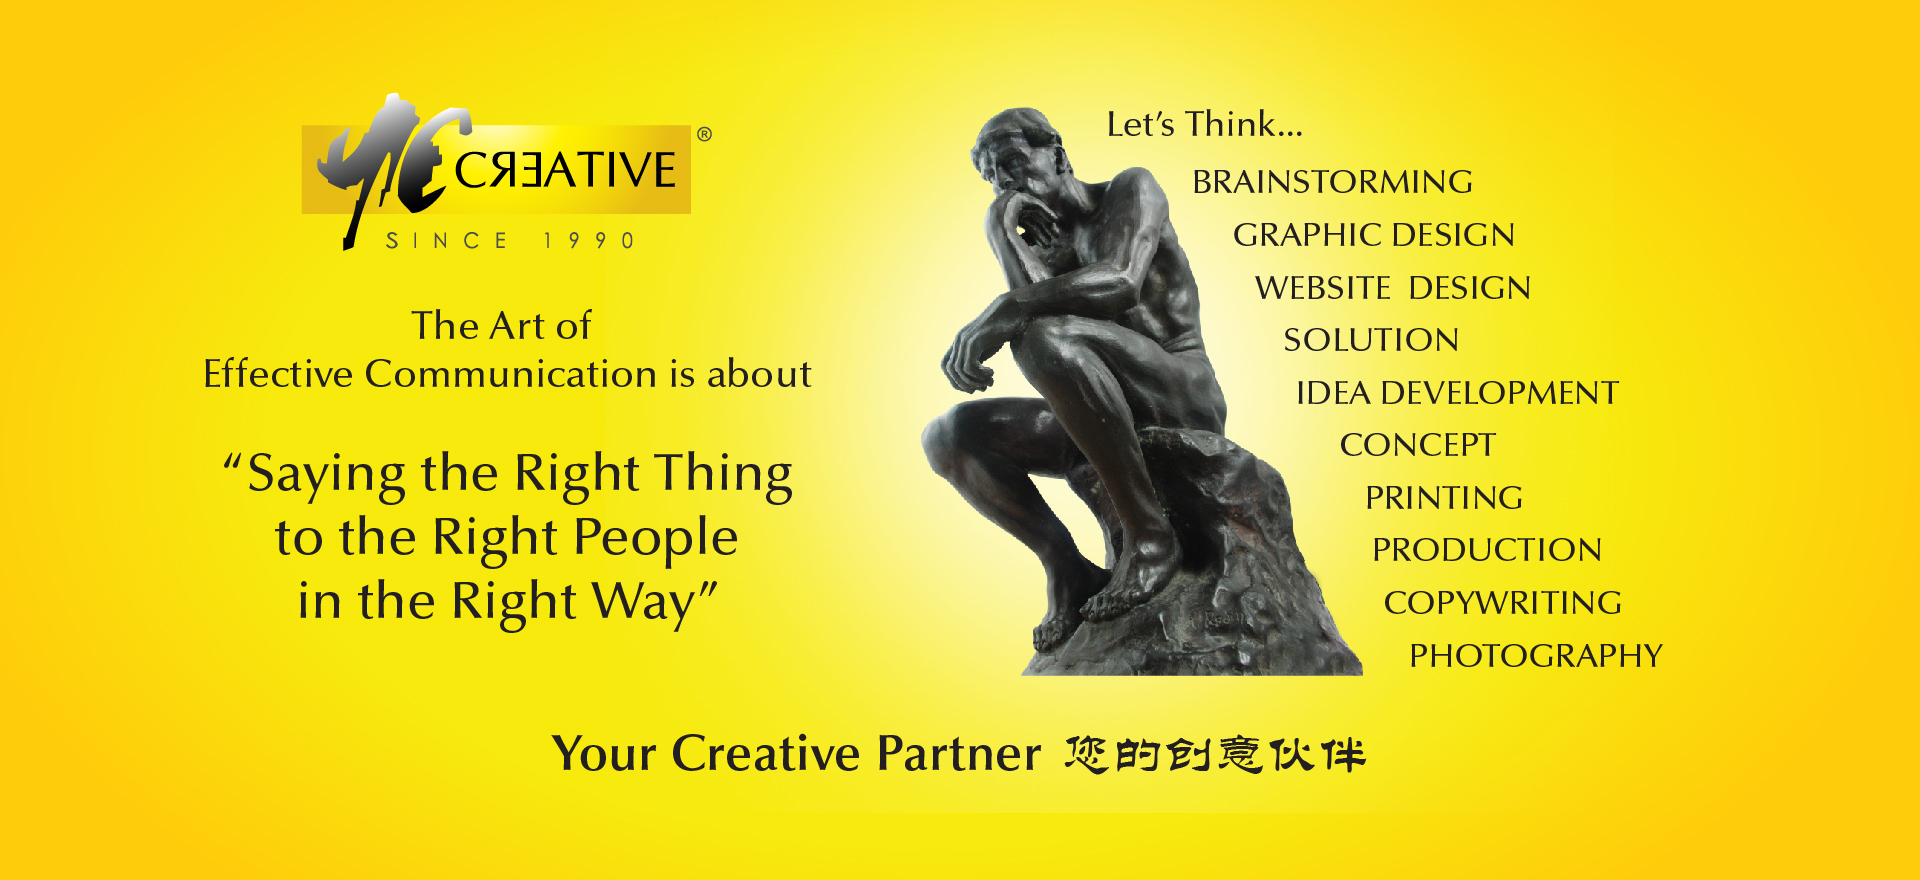 slider-yc-creative-01